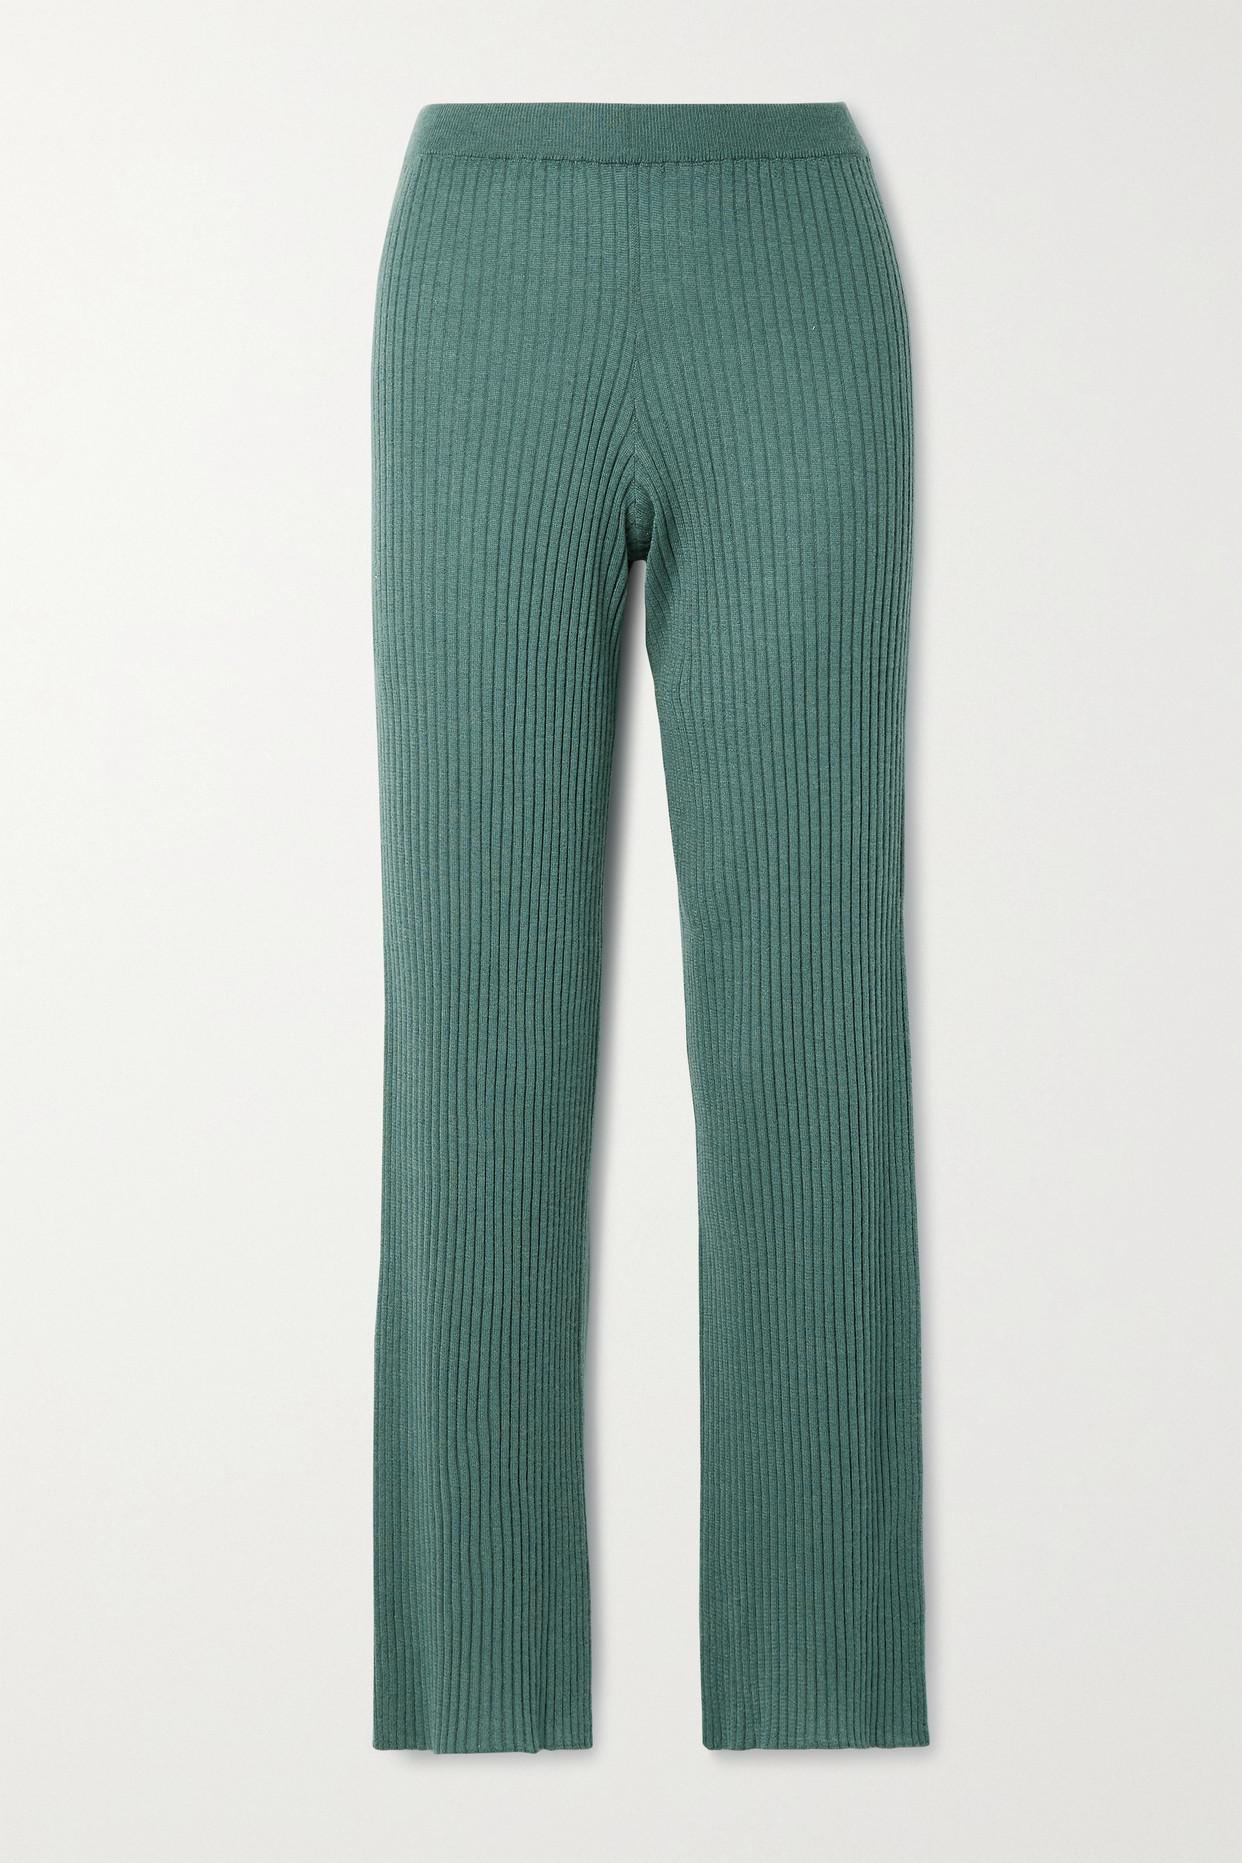 Sablyn Jordan Ribbed Cashmere Straight-leg Pants In Green